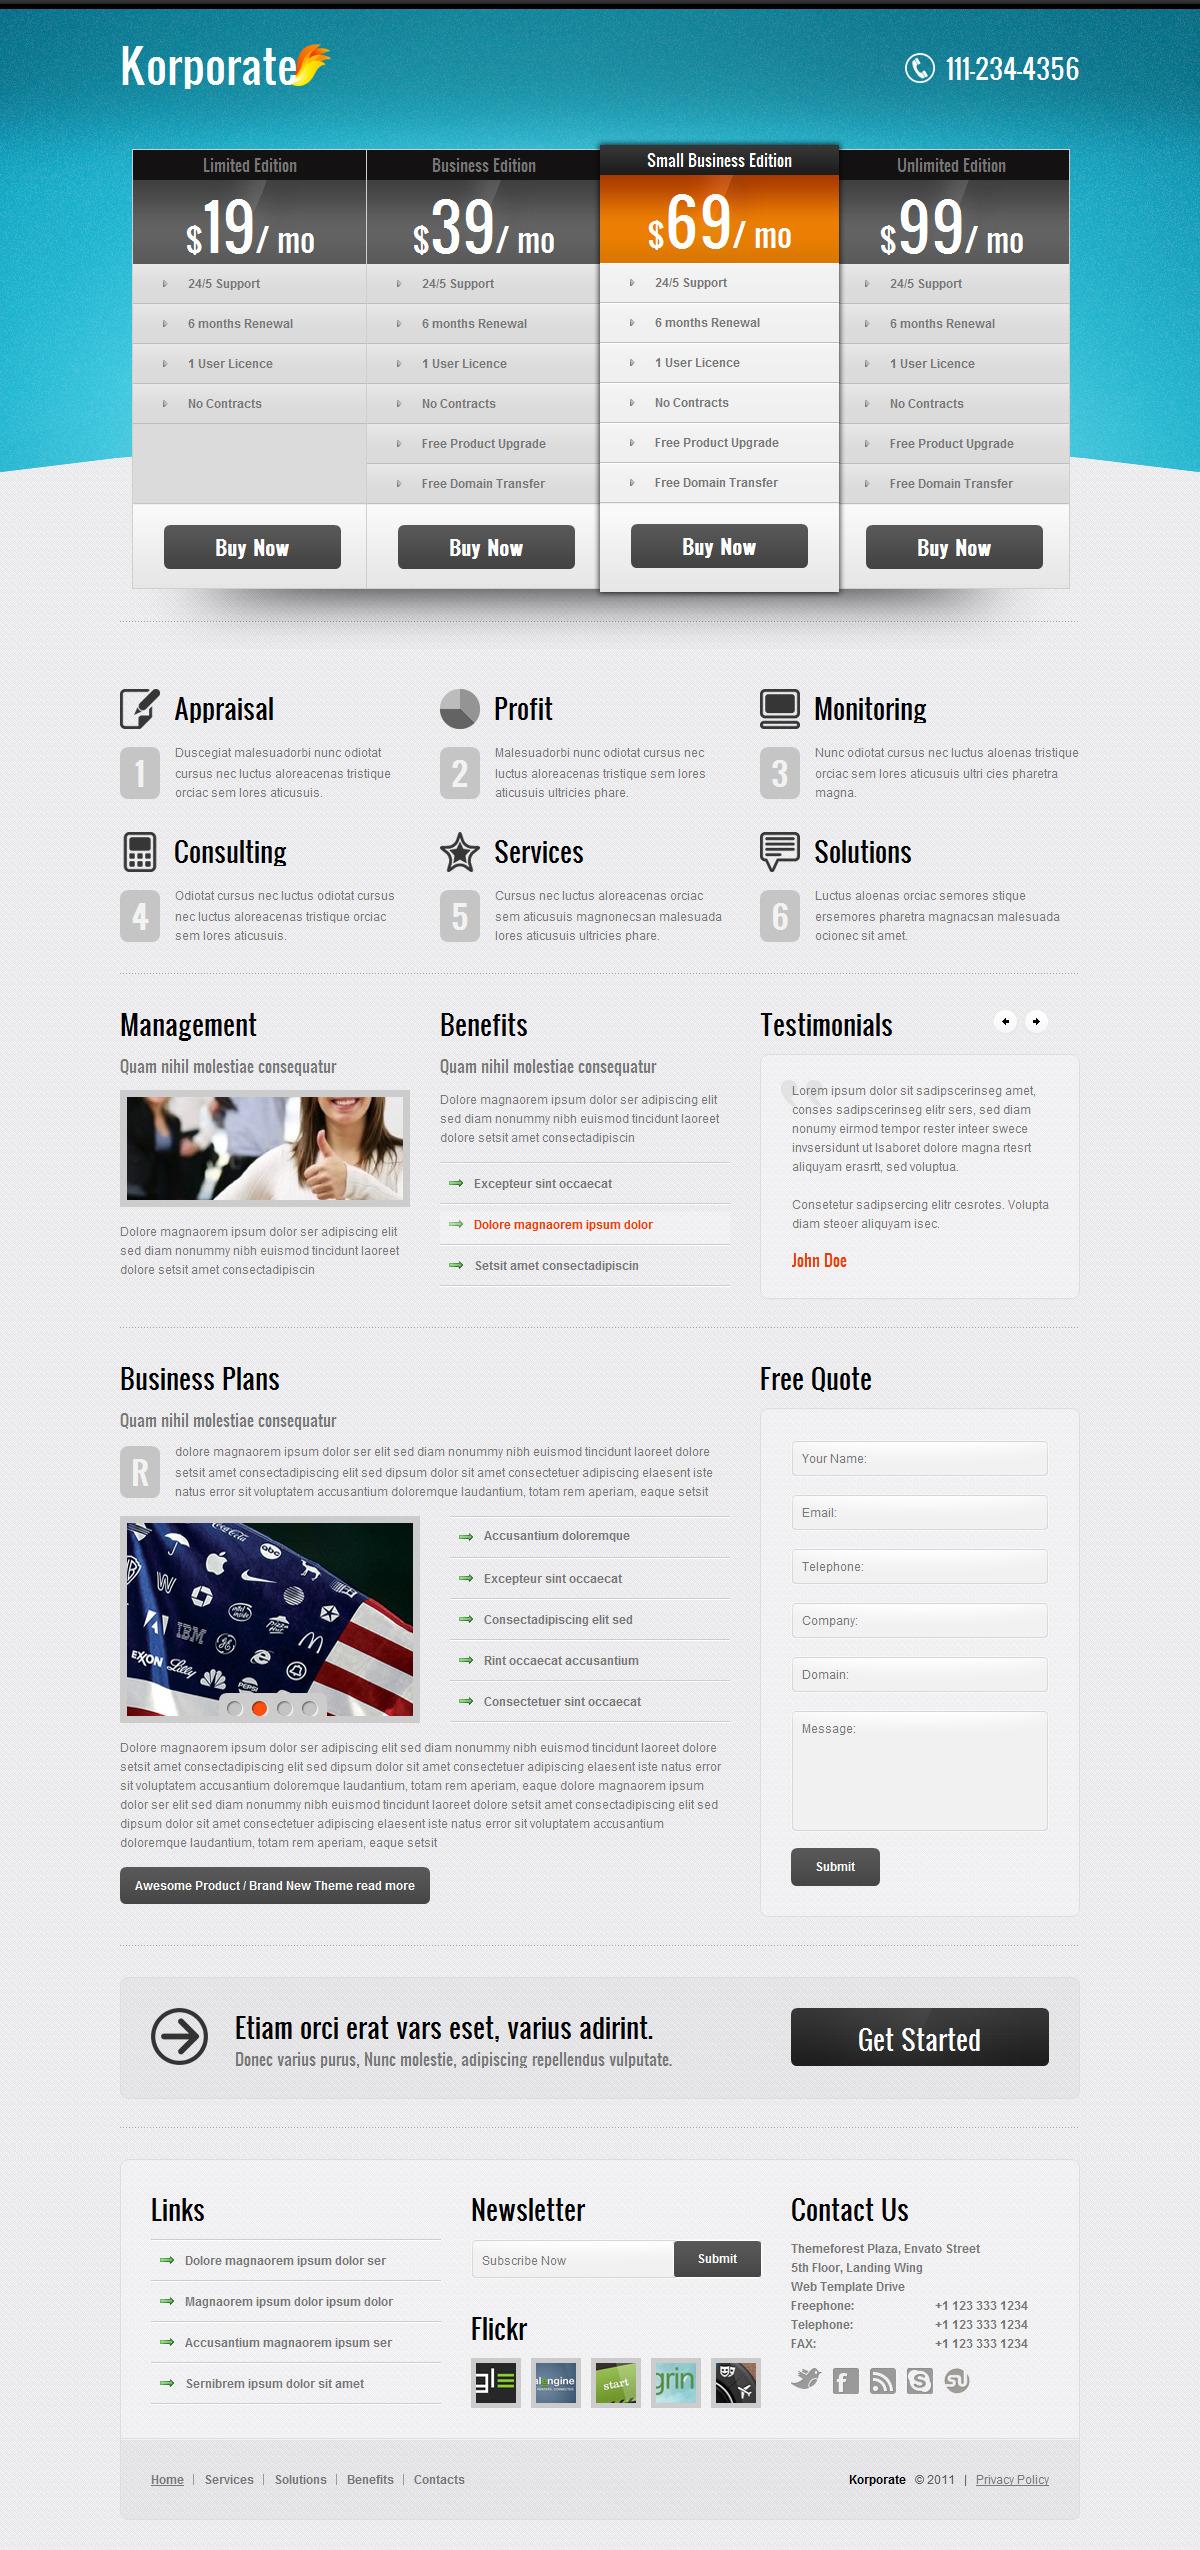 Korporate - Landing page 220 variation